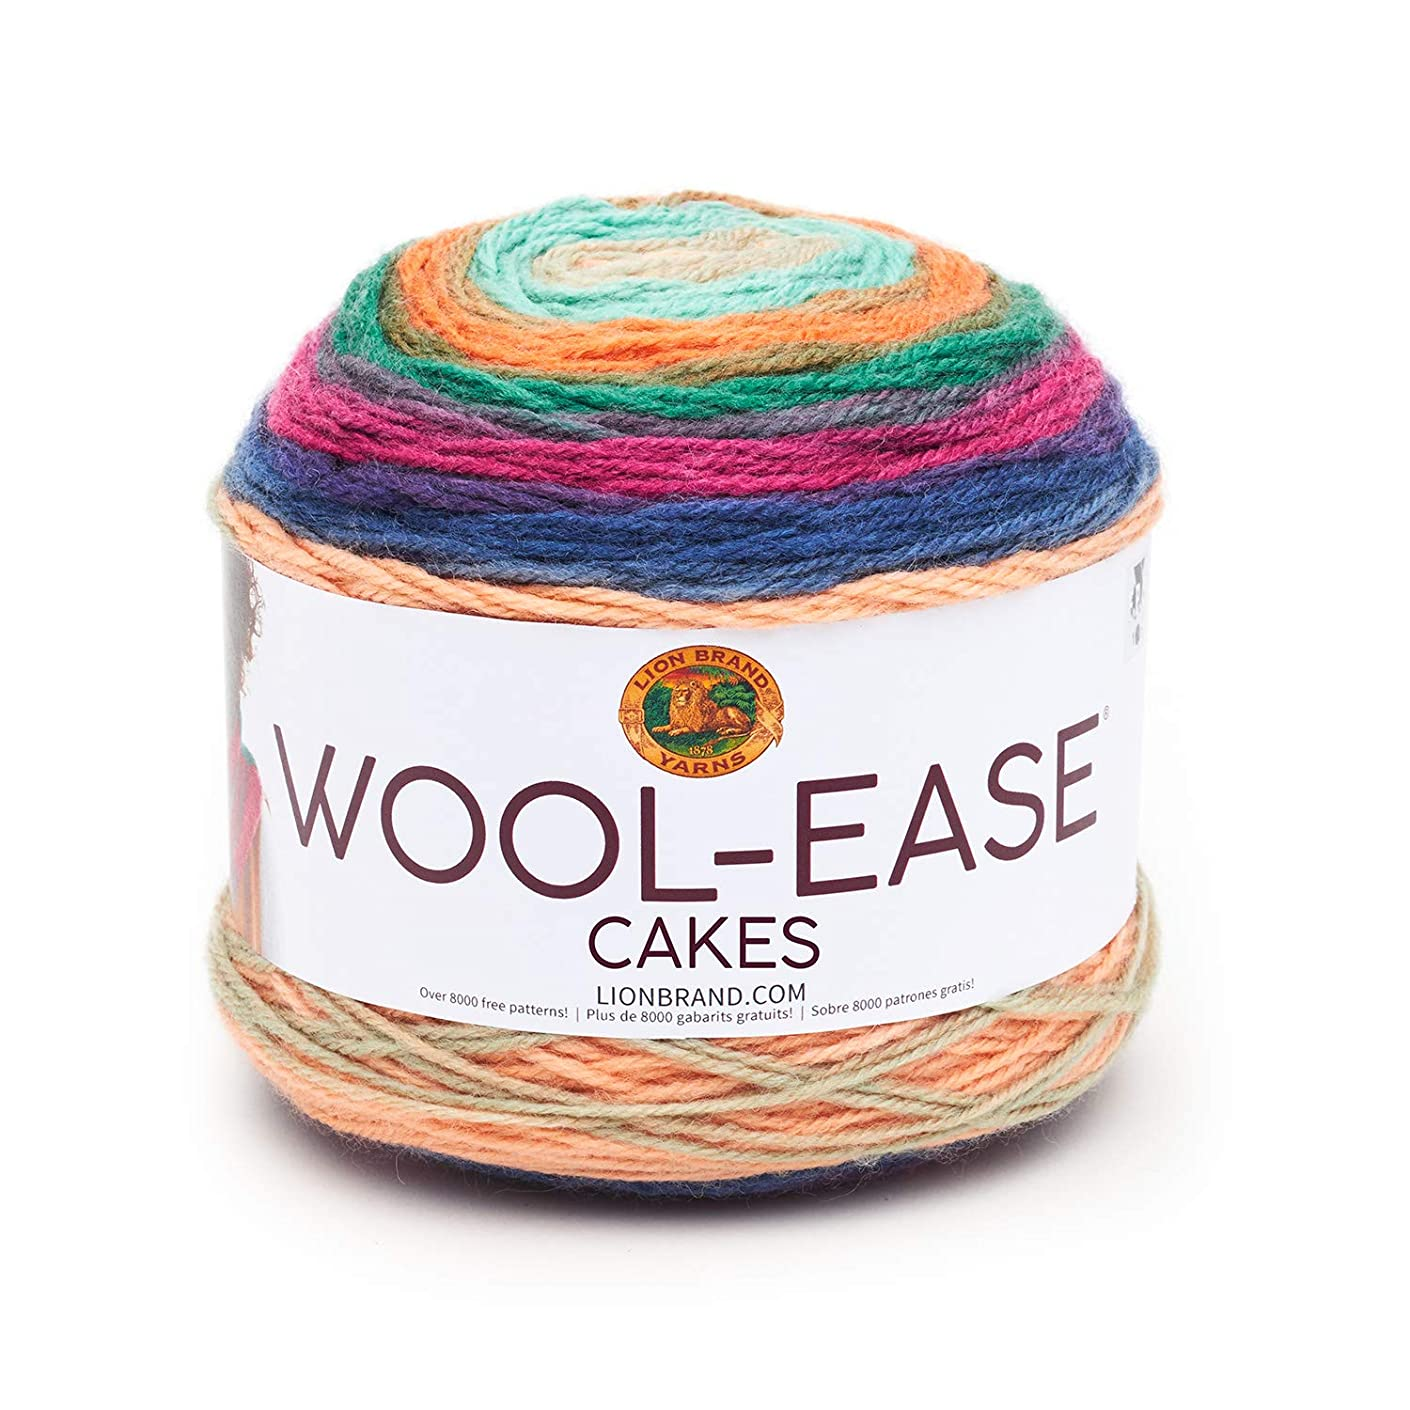 Lion Brand Yarn 621-200 Wool-Ease Cakes Yarn, One Skein, Hecate